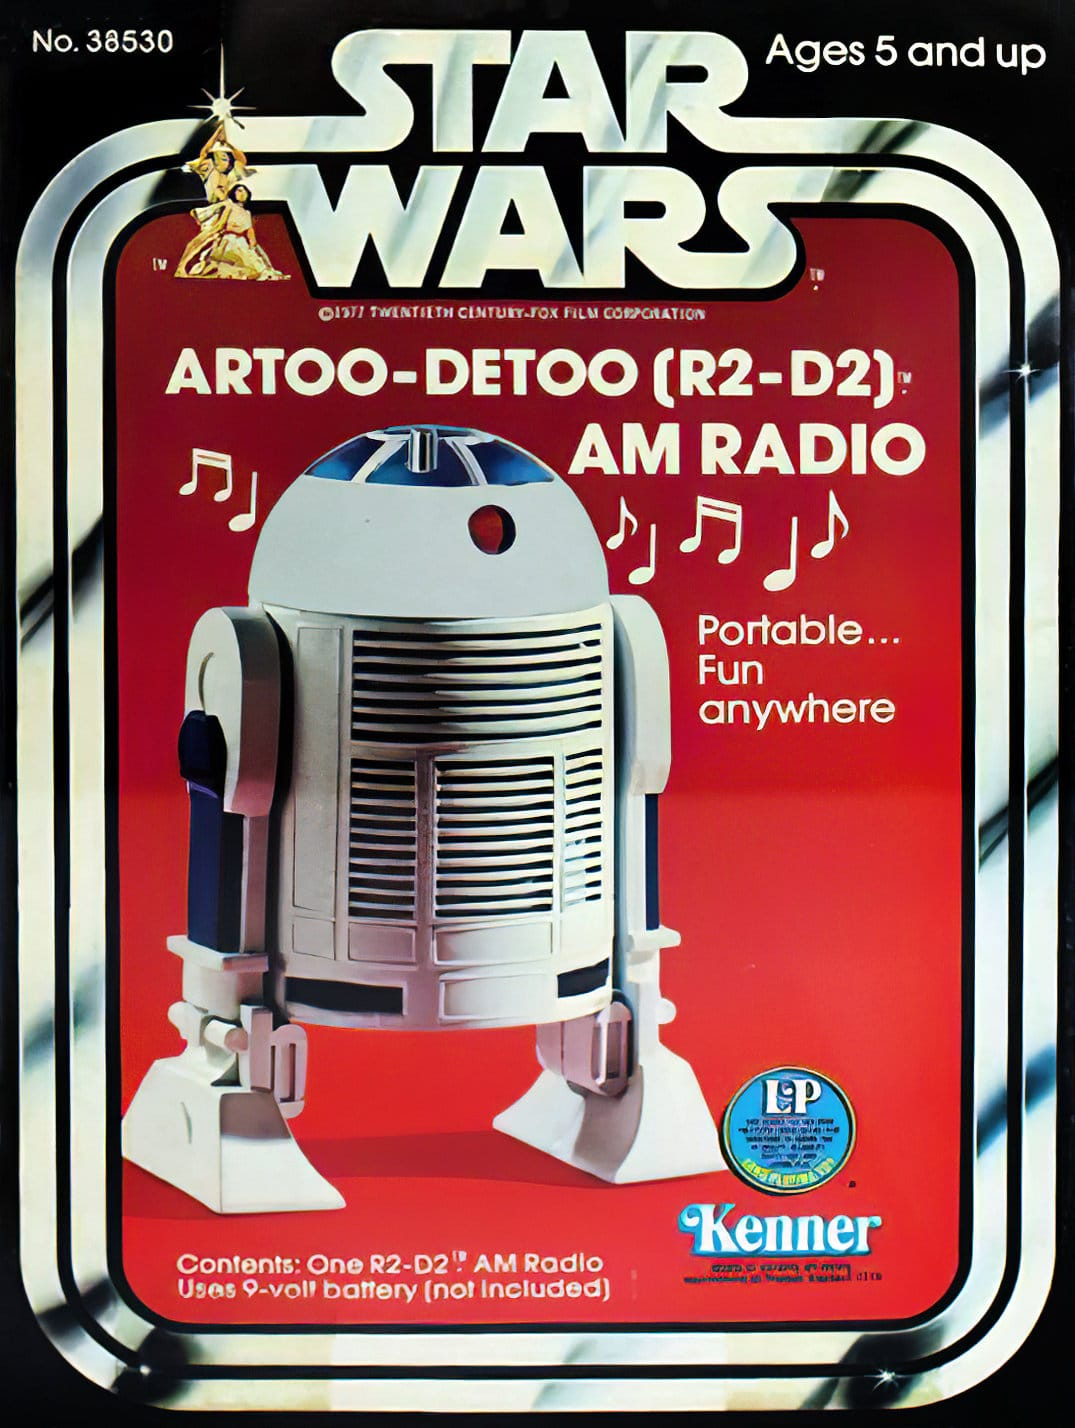 Vintage R2-D2 Star Wars portable AM radio (1977)